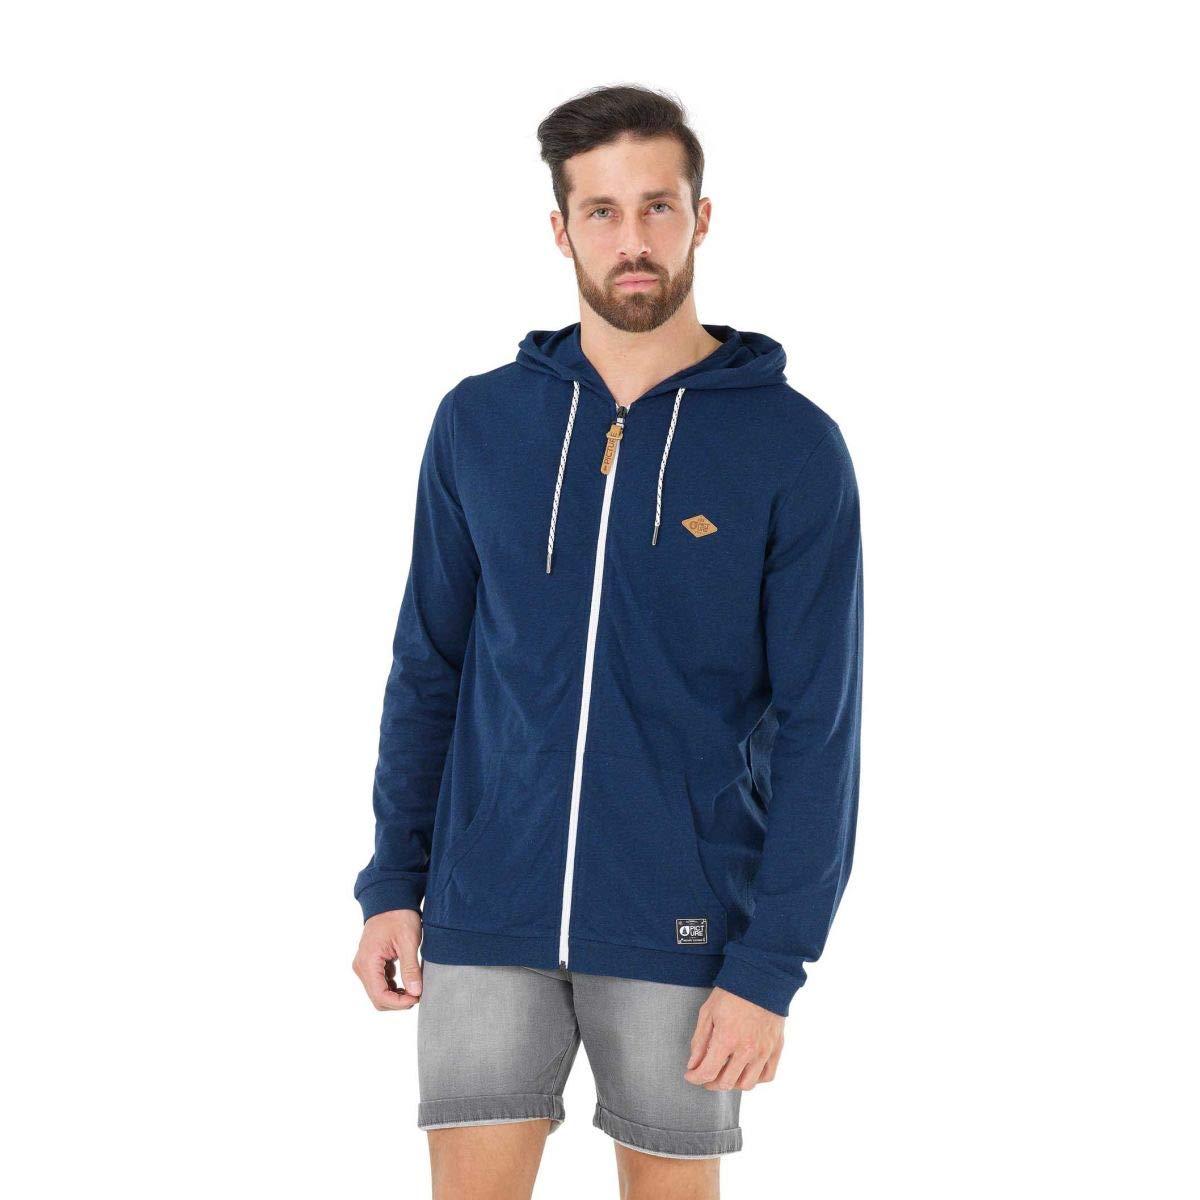 Bleu Marine L Picture Organic Clothing Basically Zip sweat à capuche Hommes